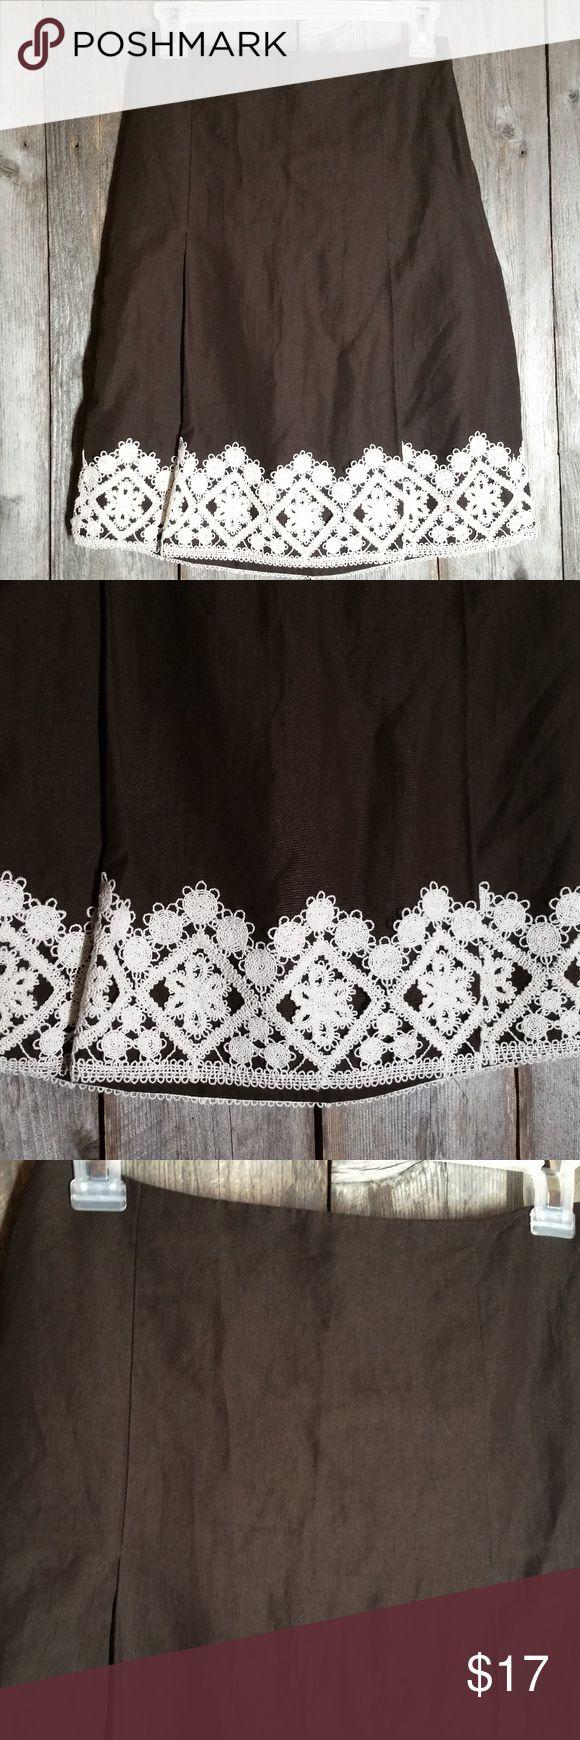 Ann Taylor Loft Petite Brown Crochet Lace Skirt Ann Taylor Loft Petite Size 0P Womens Brown Crochet Lace Hem Skirt Linen Blend Gently used Linen & rayon Lined Side zipper closure Approx waist 26 & length 21 Knee length Dry clean (T14) LOFT Skirts